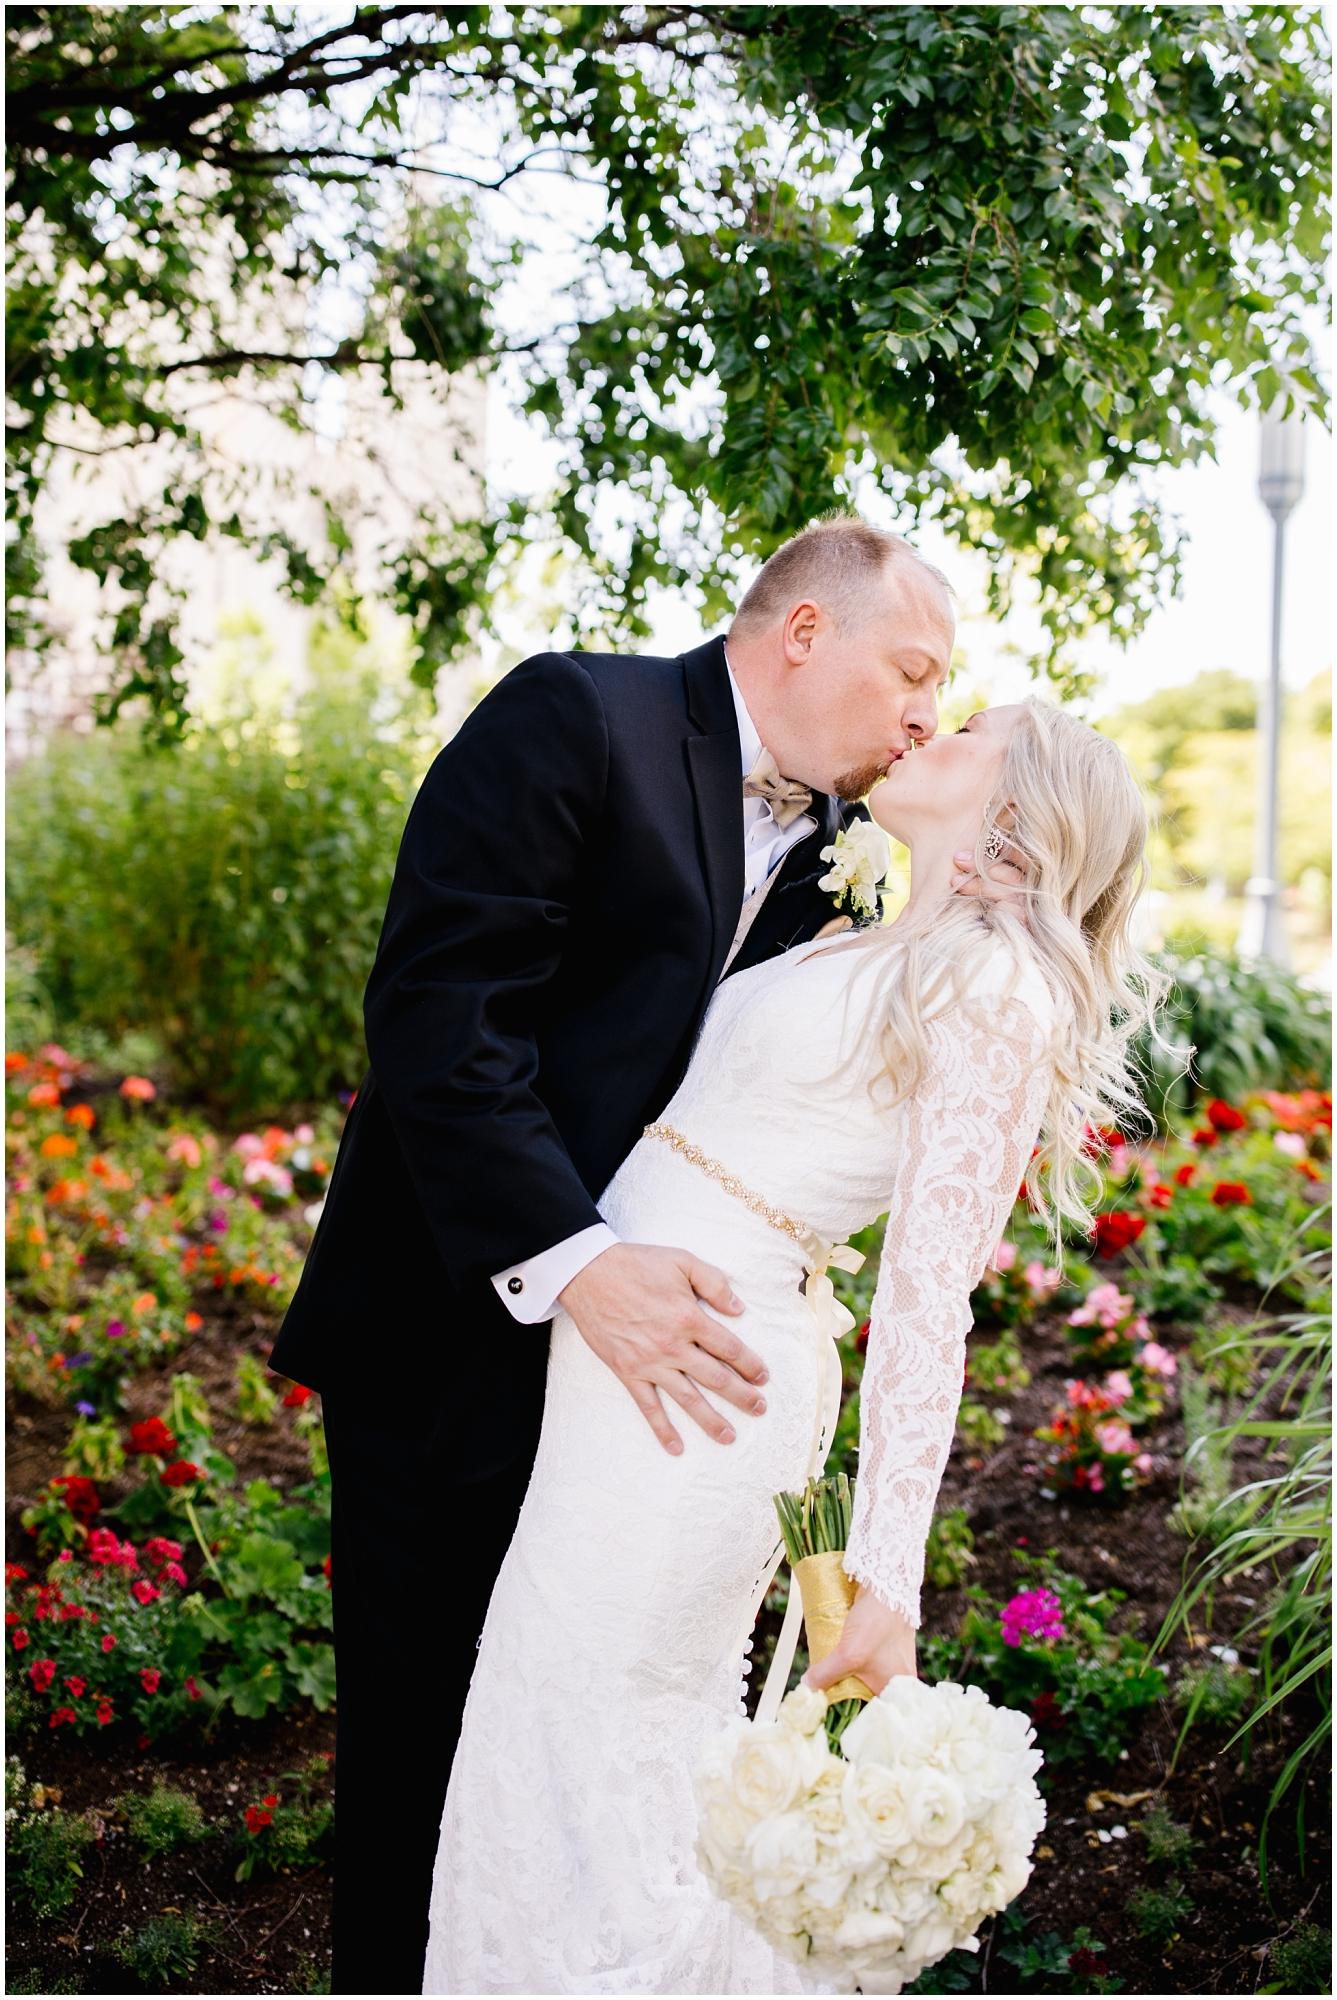 CherylandTyler-302_Lizzie-B-Imagery-Utah-Wedding-Photographer-Park-City-Salt-Lake-City-Temple-Wells-Fargo-Building.jpg